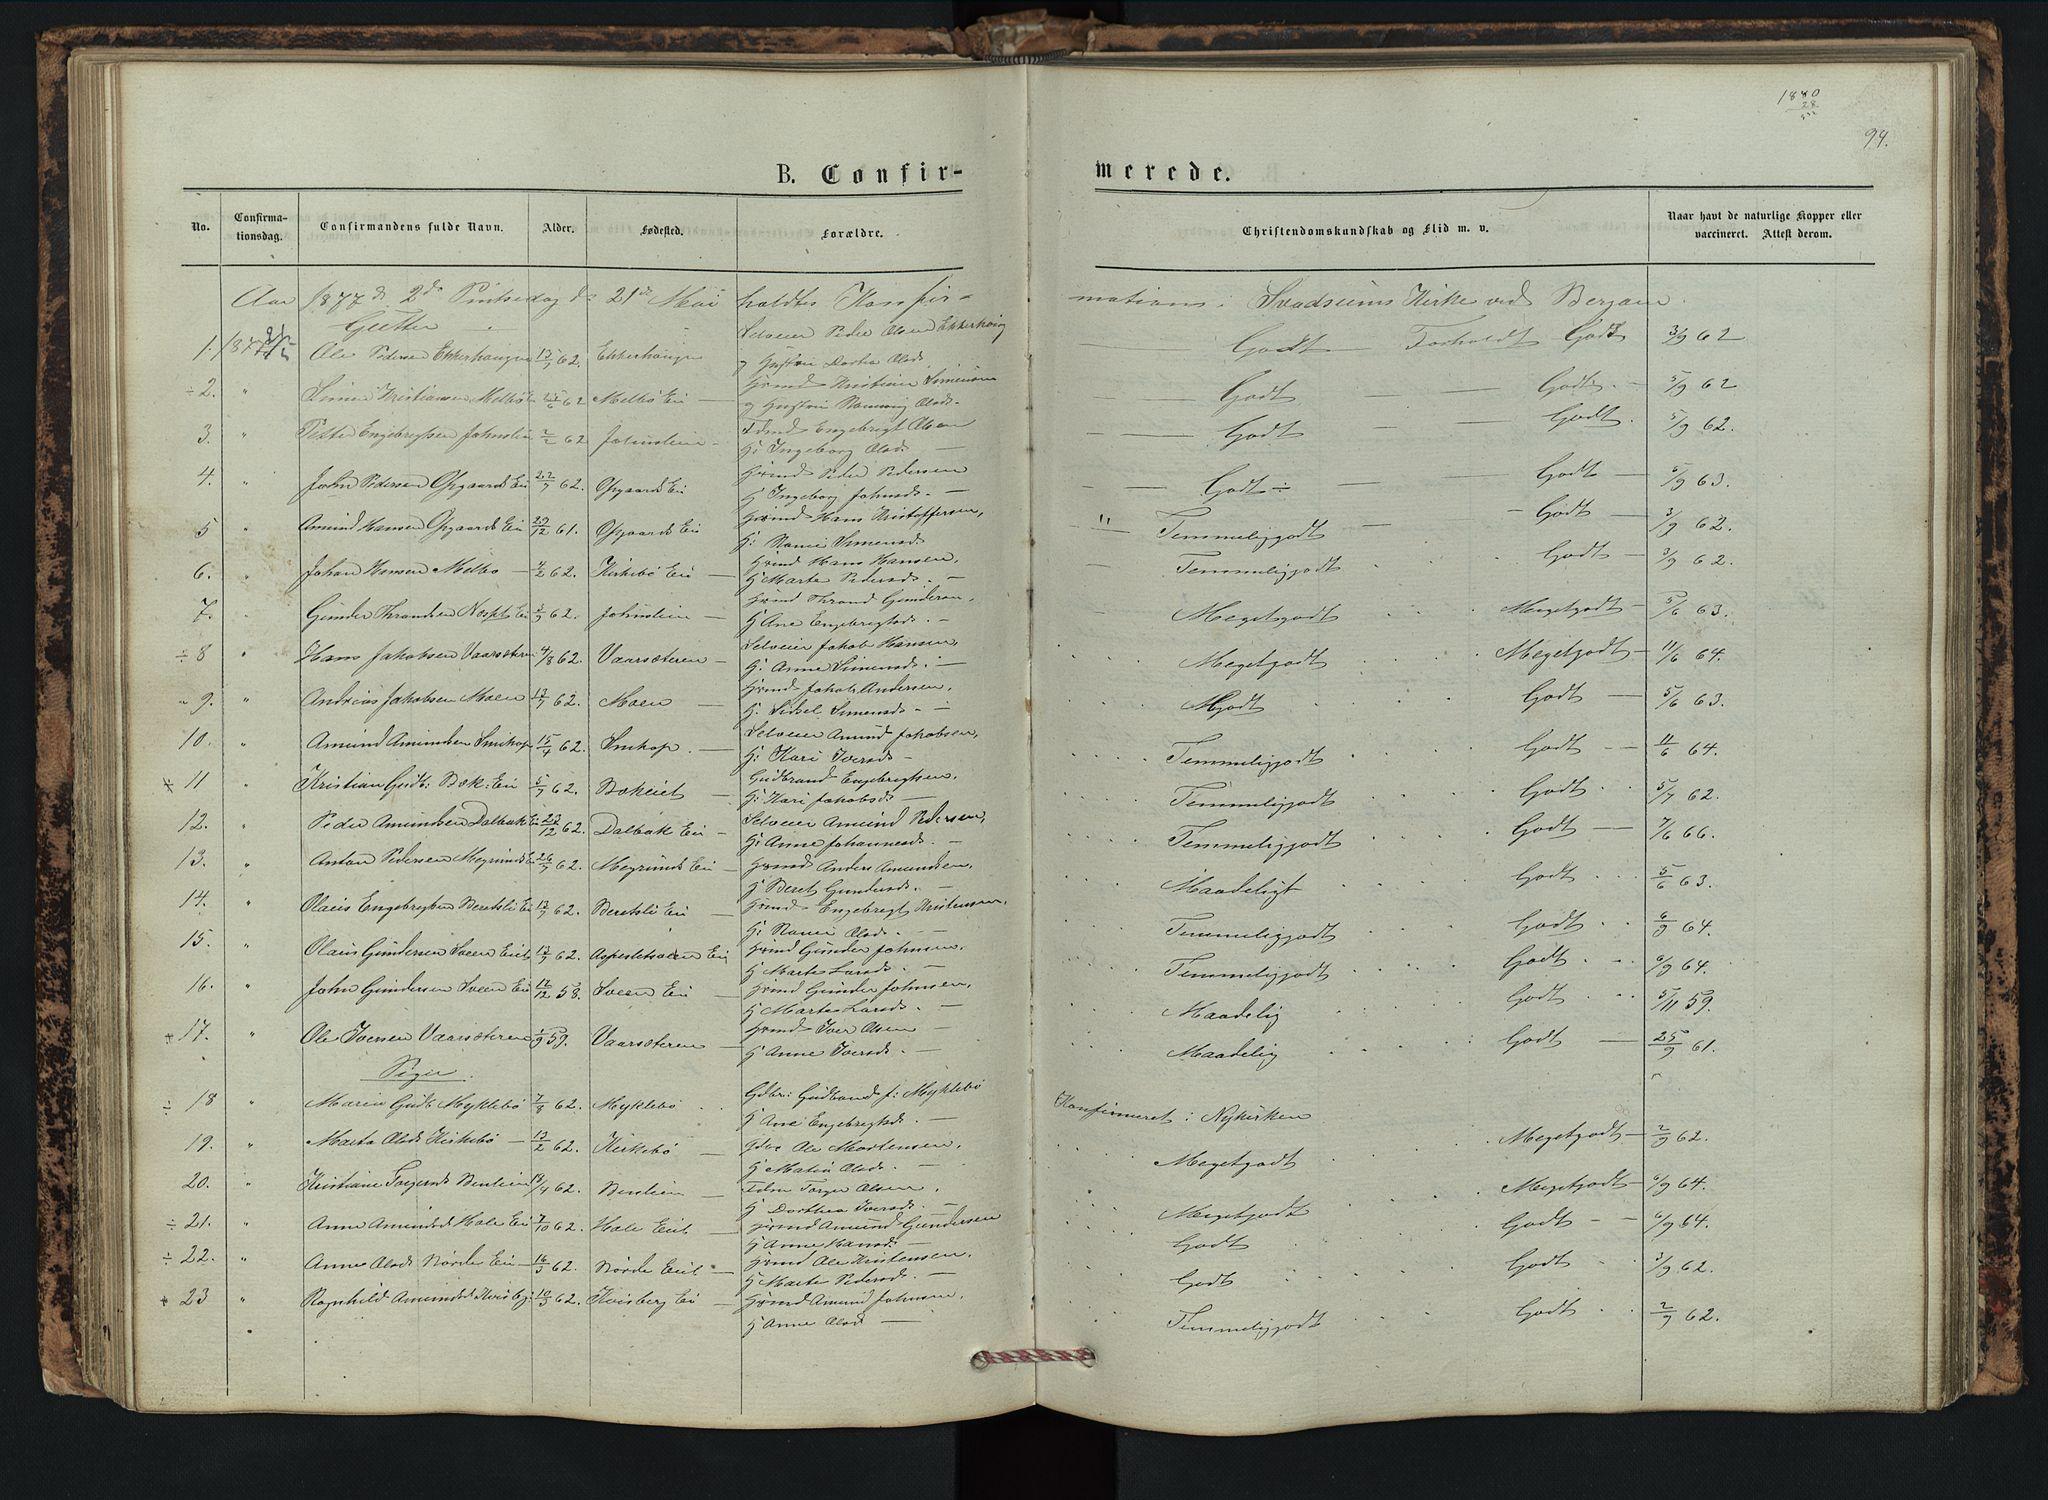 SAH, Vestre Gausdal prestekontor, Klokkerbok nr. 2, 1874-1897, s. 94